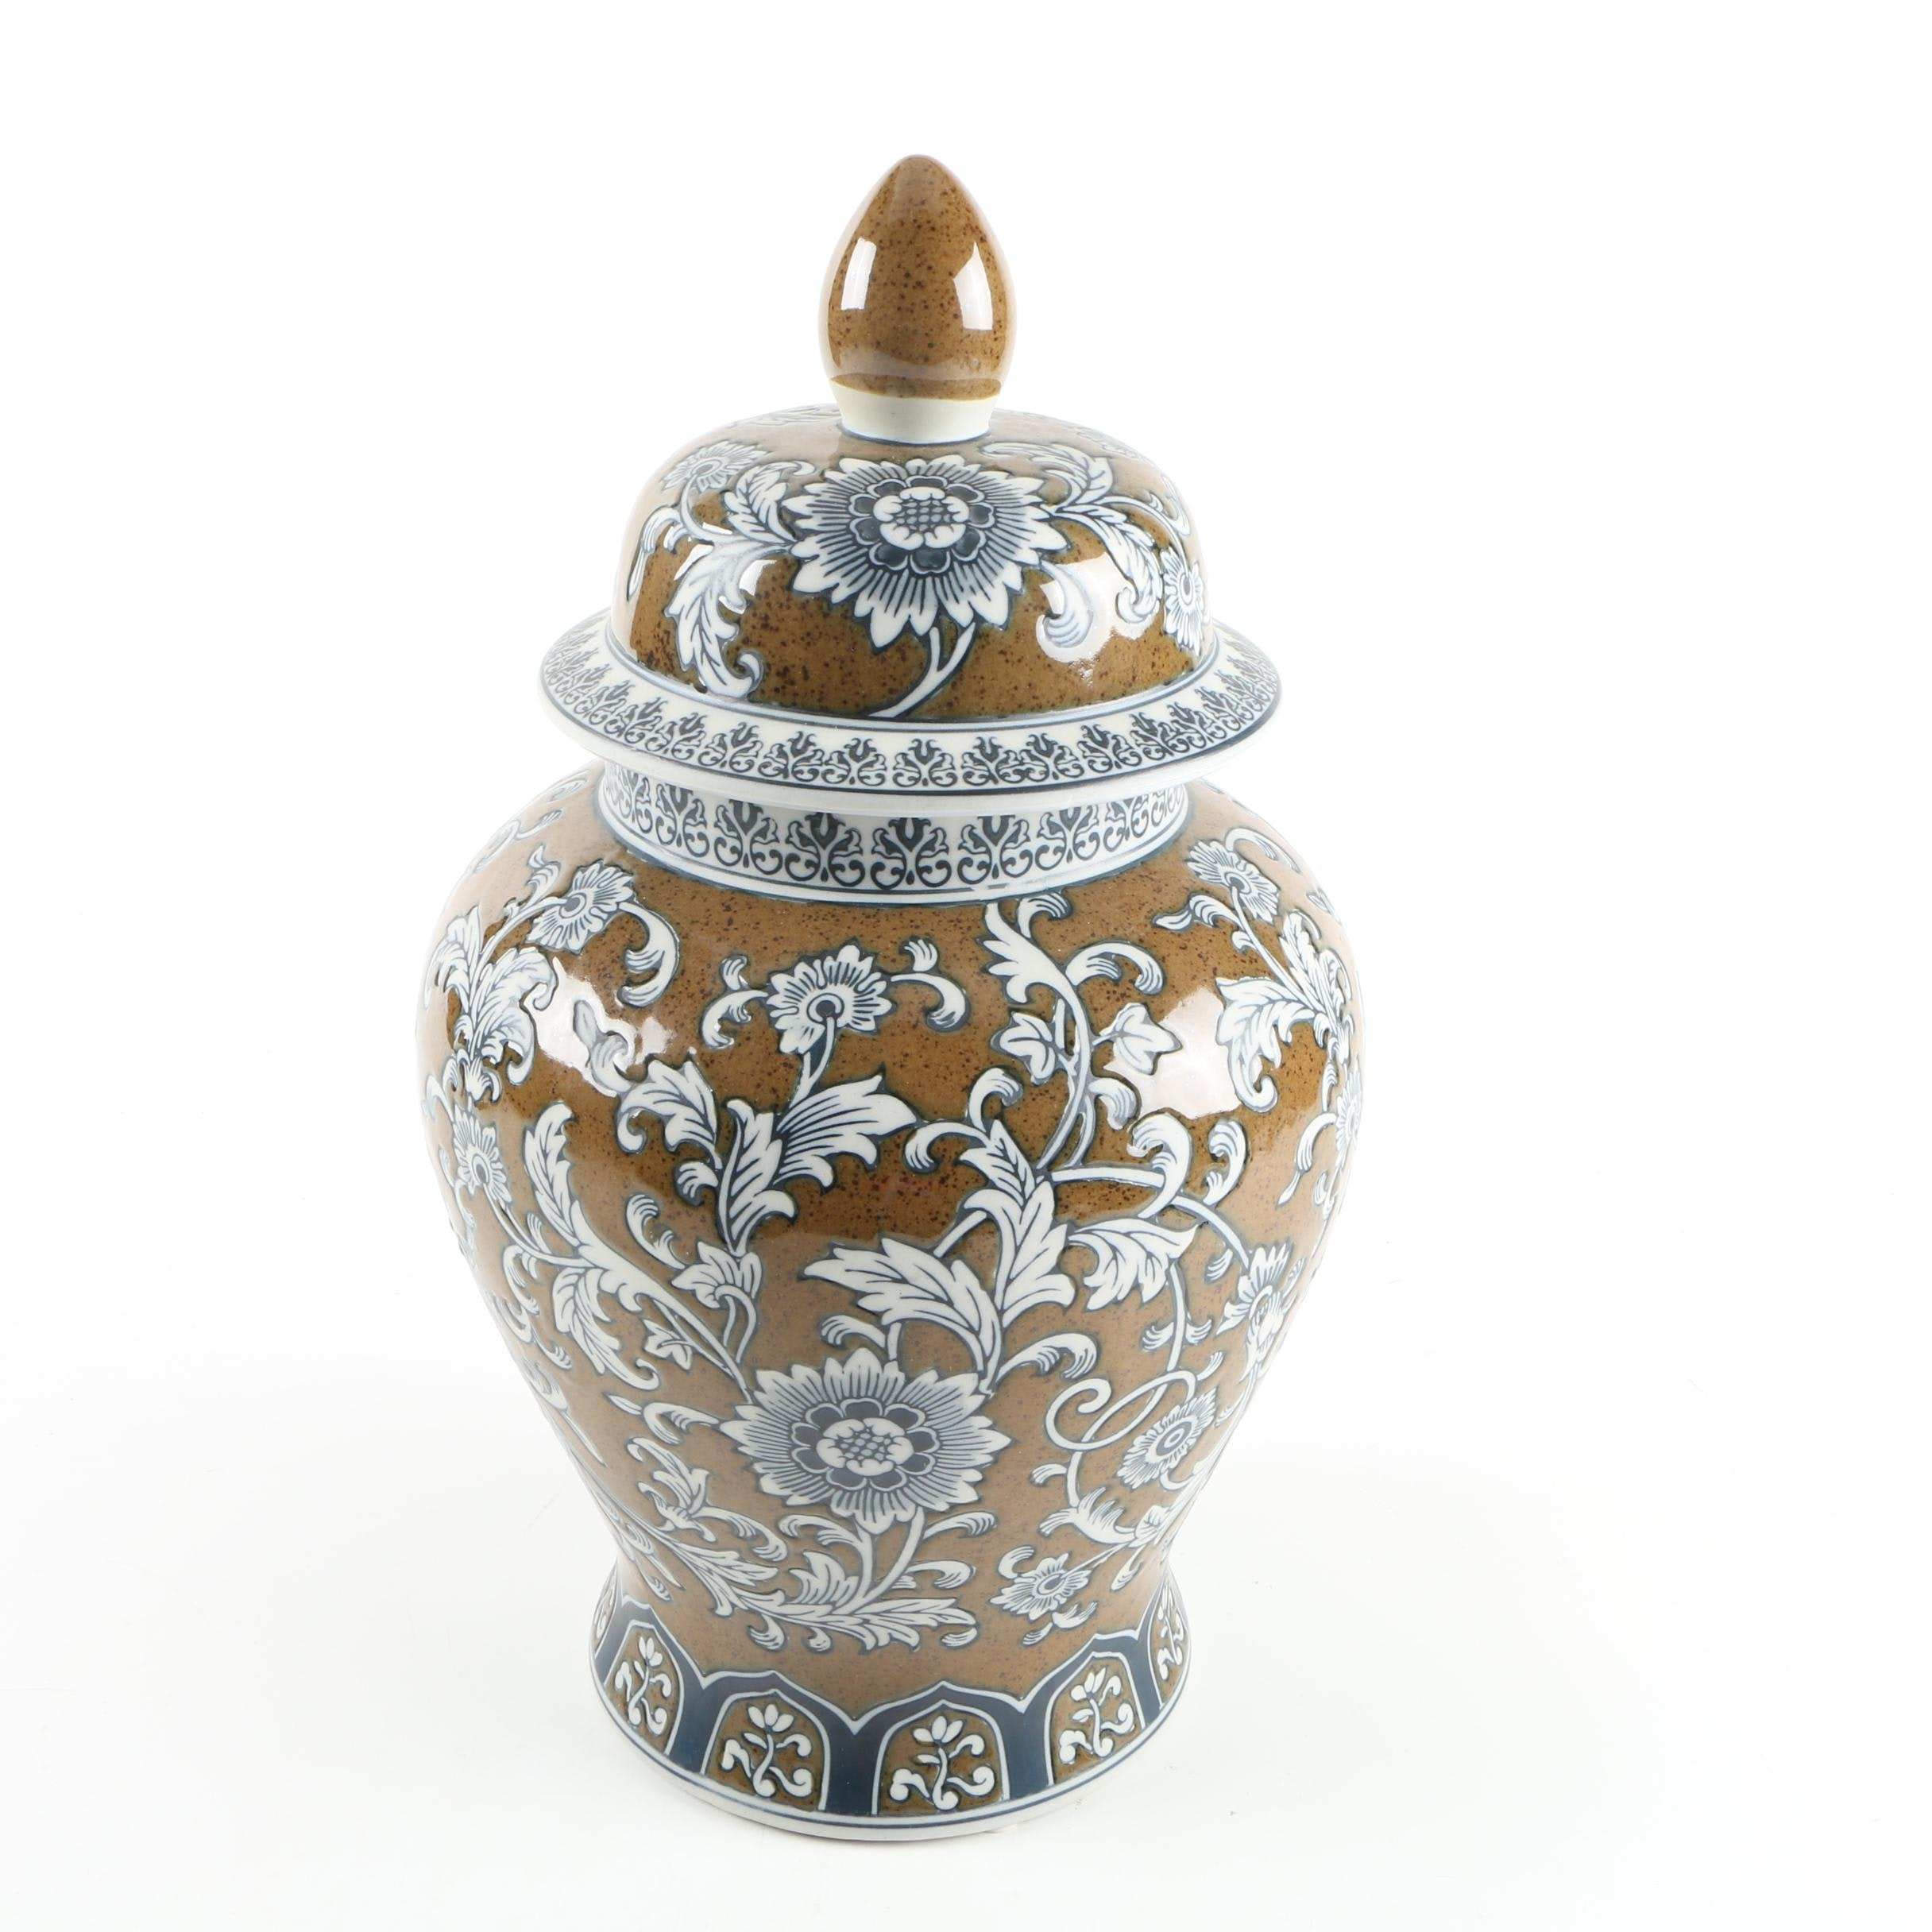 White And Brown Floral Motif Ginger Jar